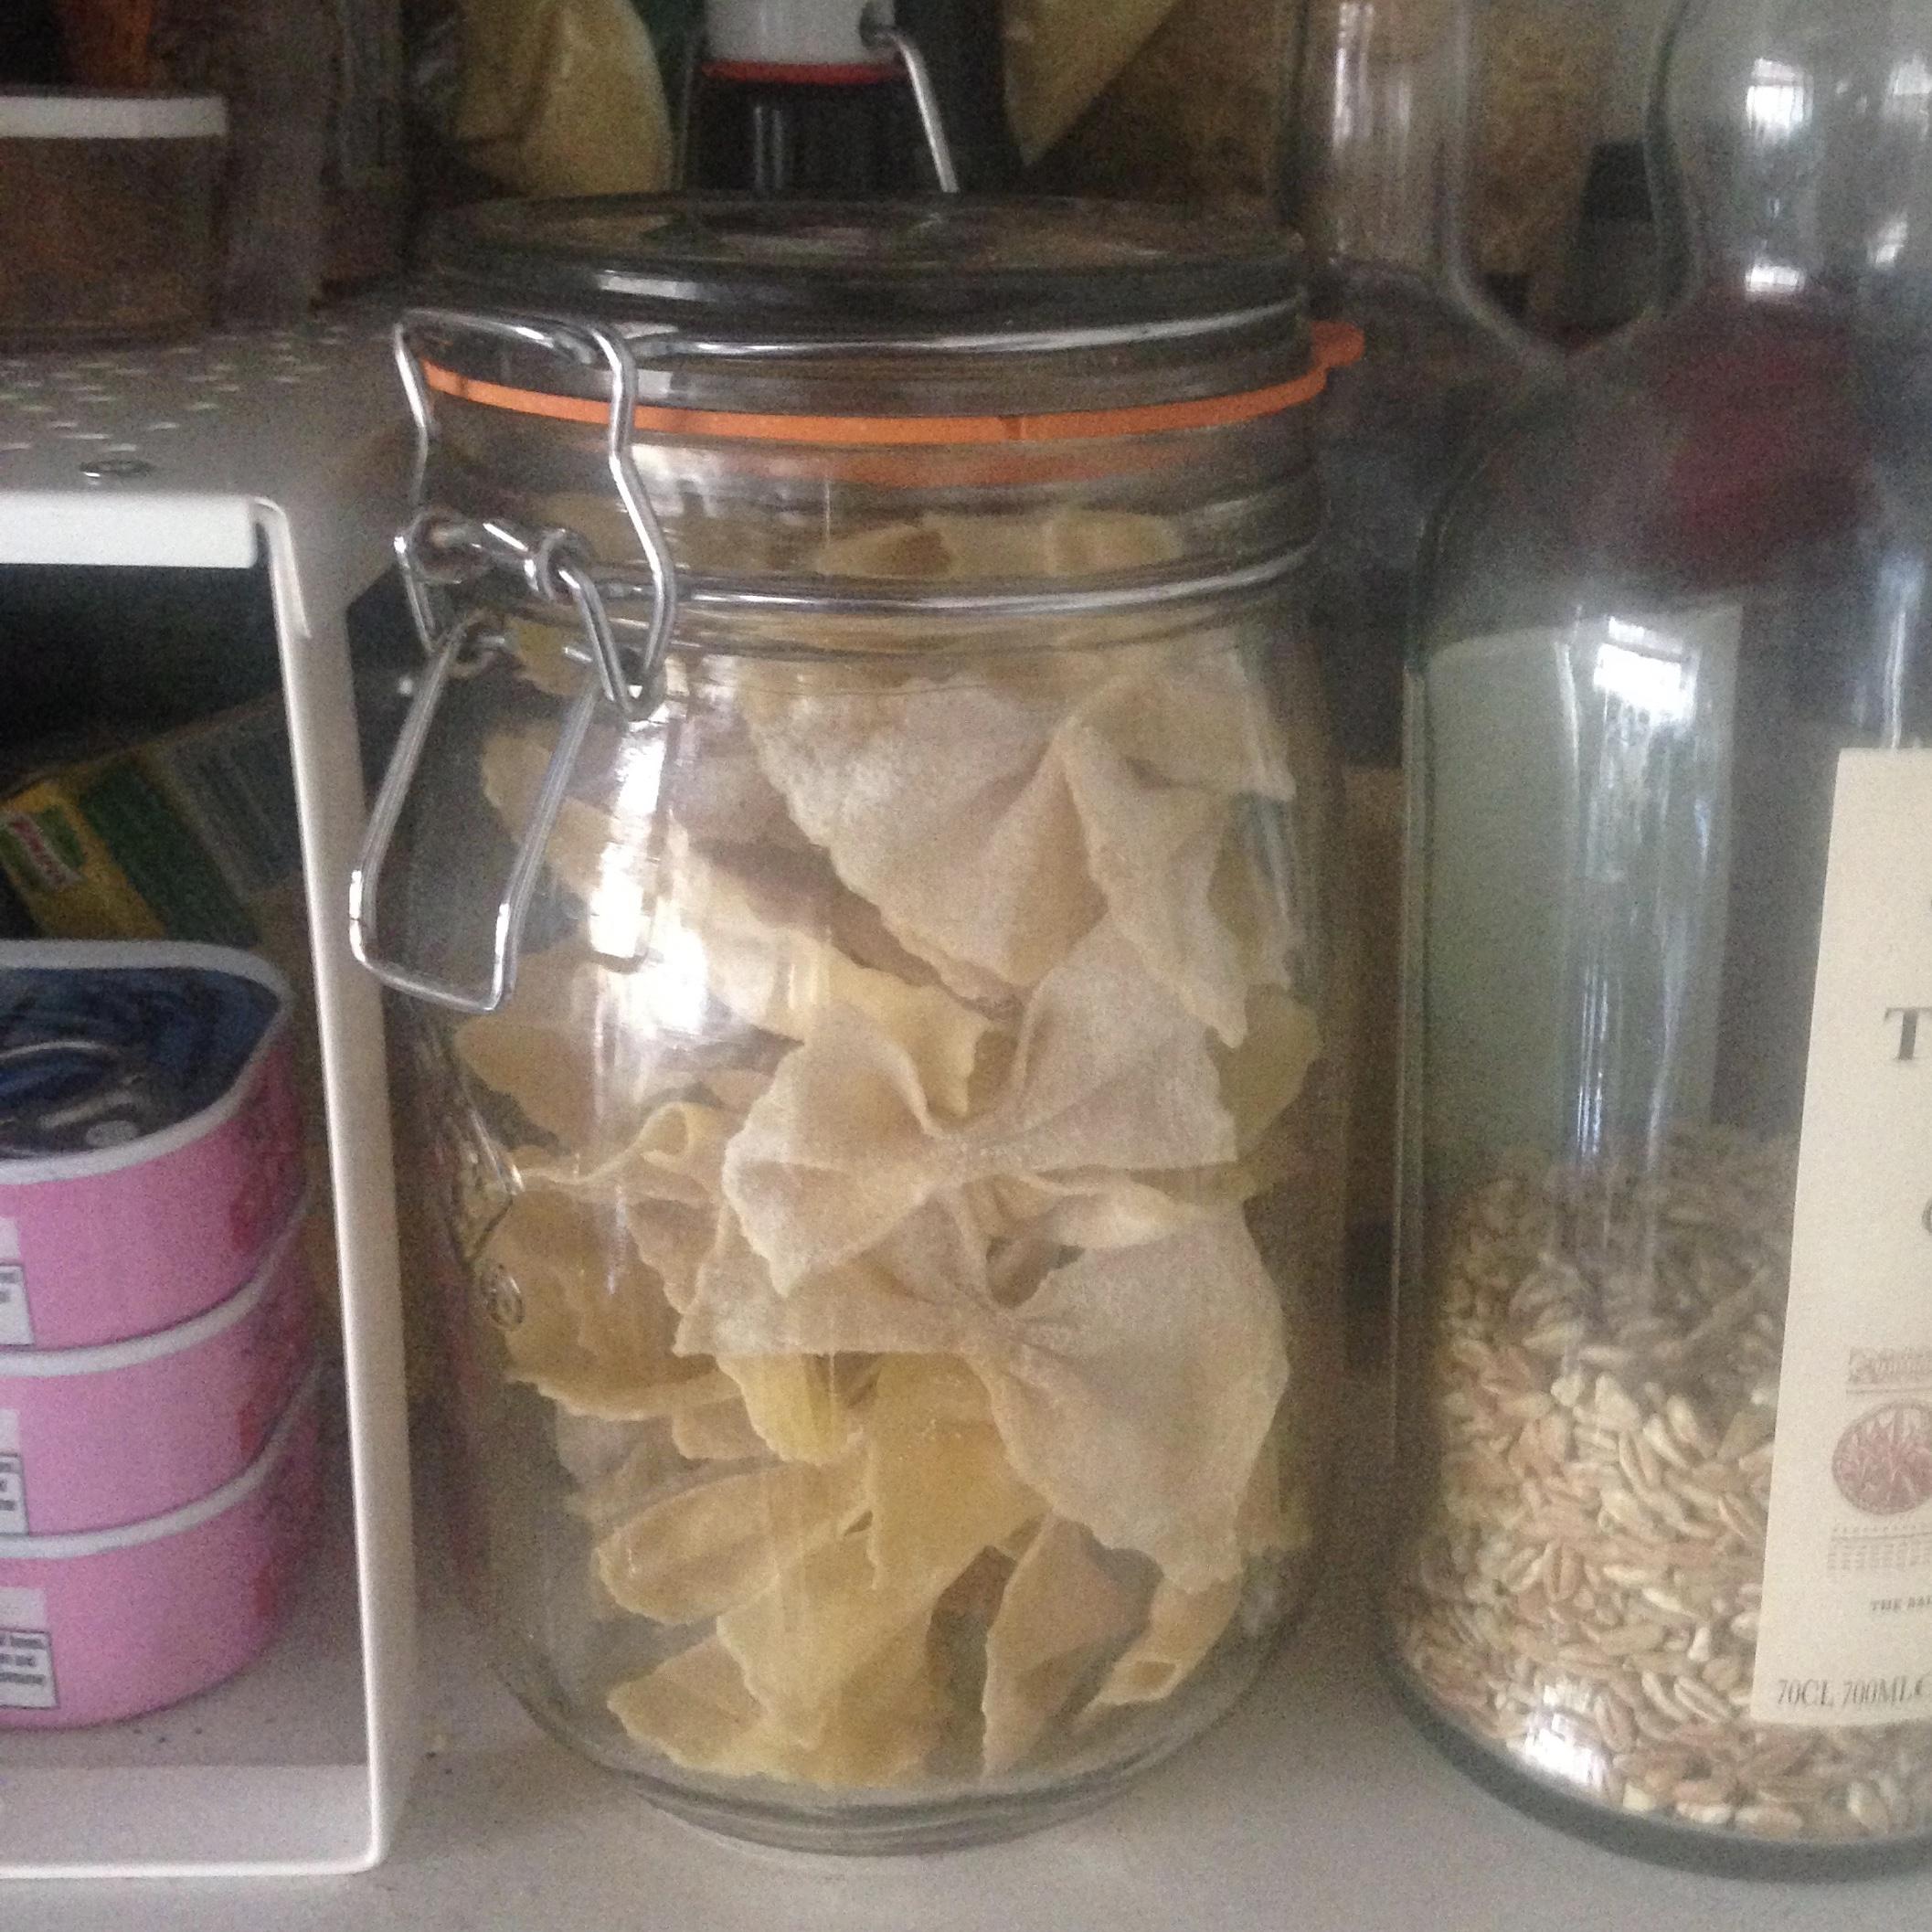 A jar of homemade farfalle